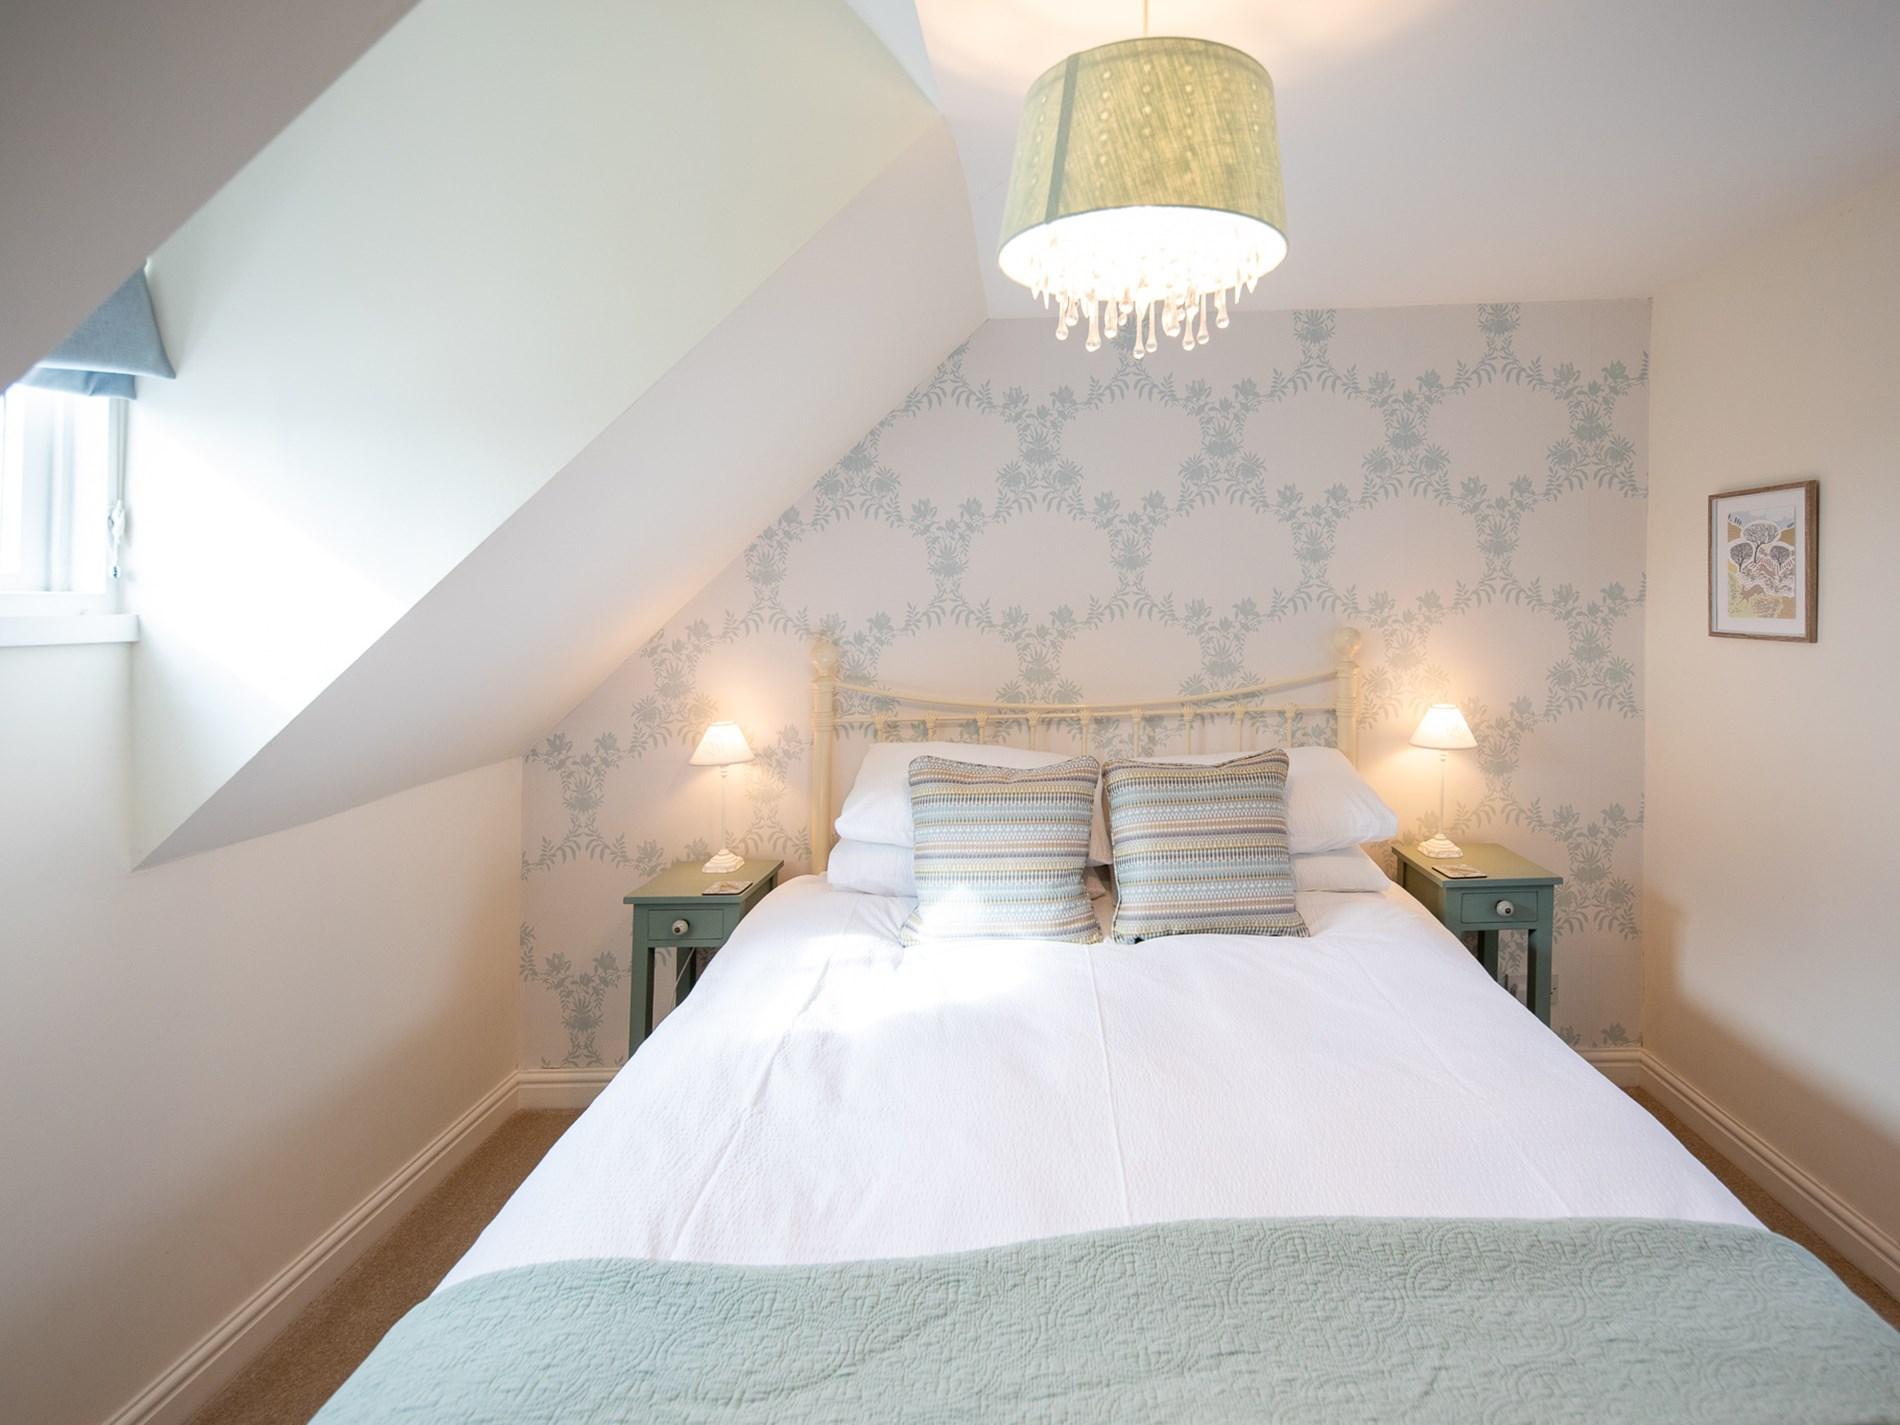 2 Bedroom Cottage in Scottish Borders, Scottish Borders